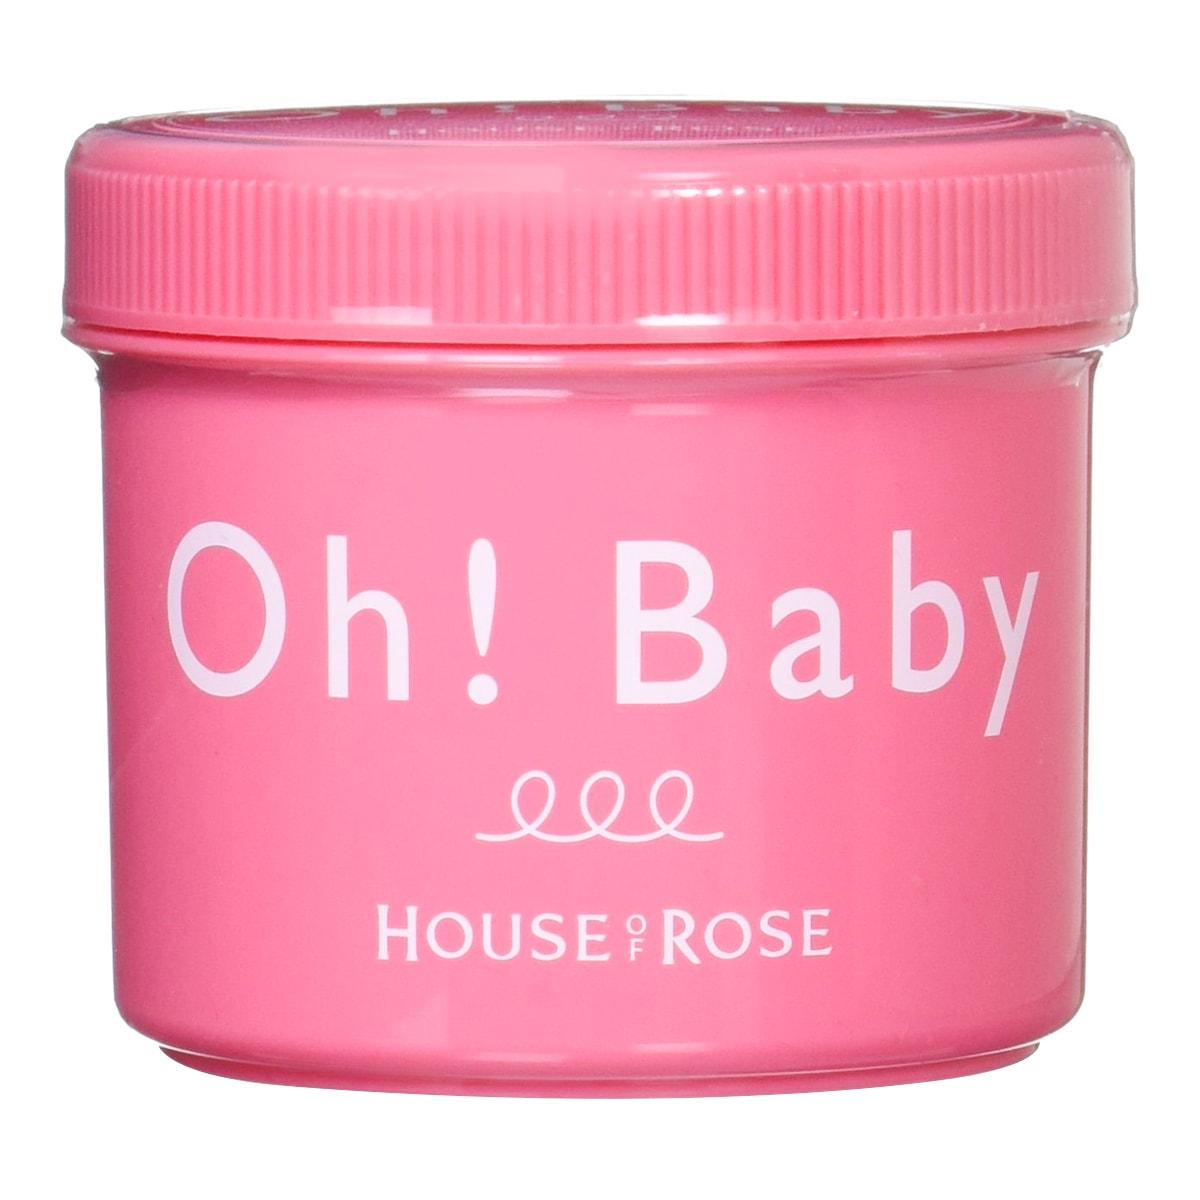 日本HOUSE OF ROSE OH!BABY 身体去角质磨砂膏 570g